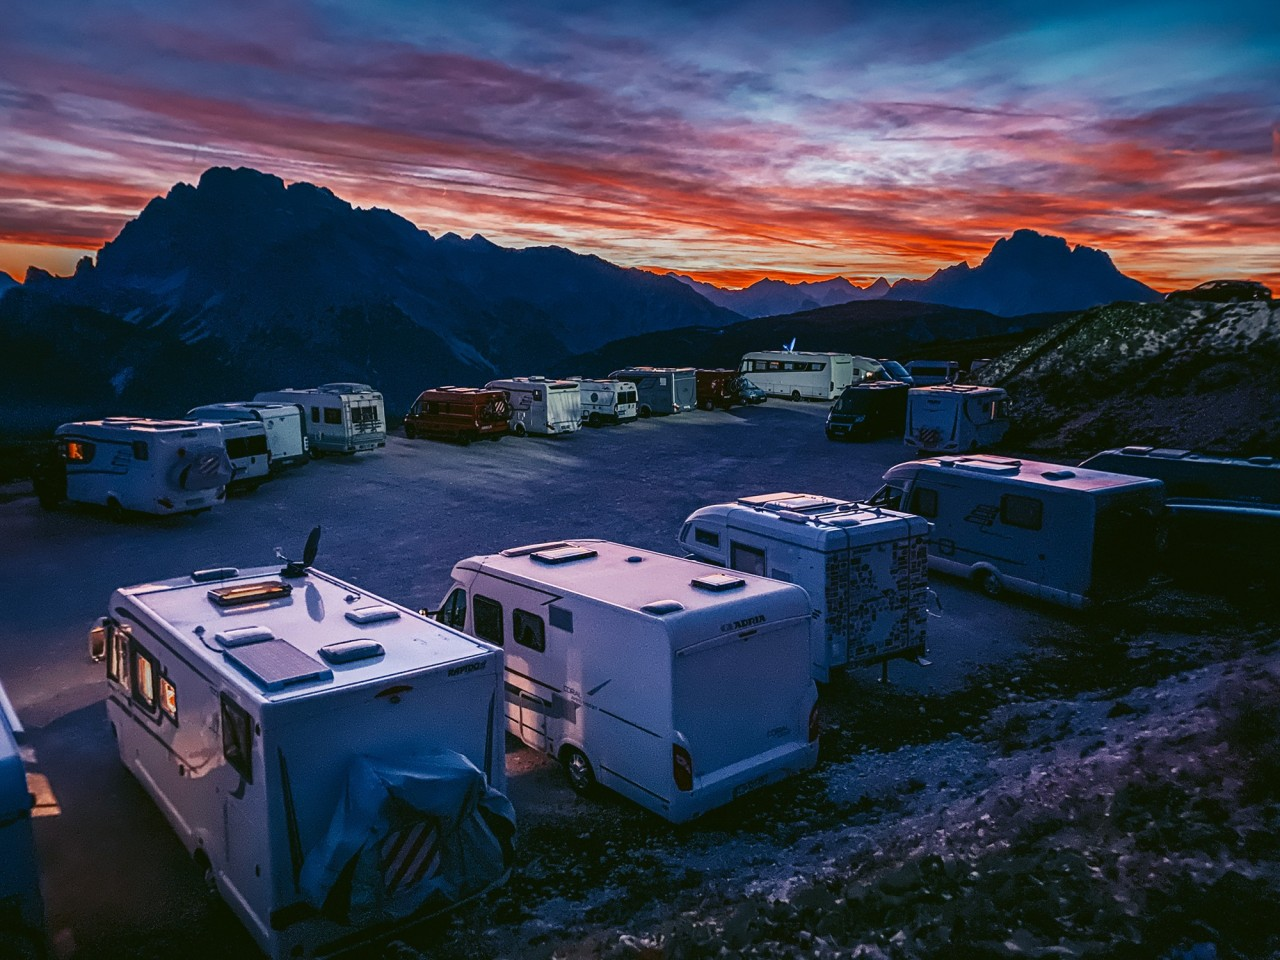 1 место в категории «Закат», 2020. Сумерки в Доломитах. Ауронцо-ди-Кадоре, Италия. Автор Лео Чан